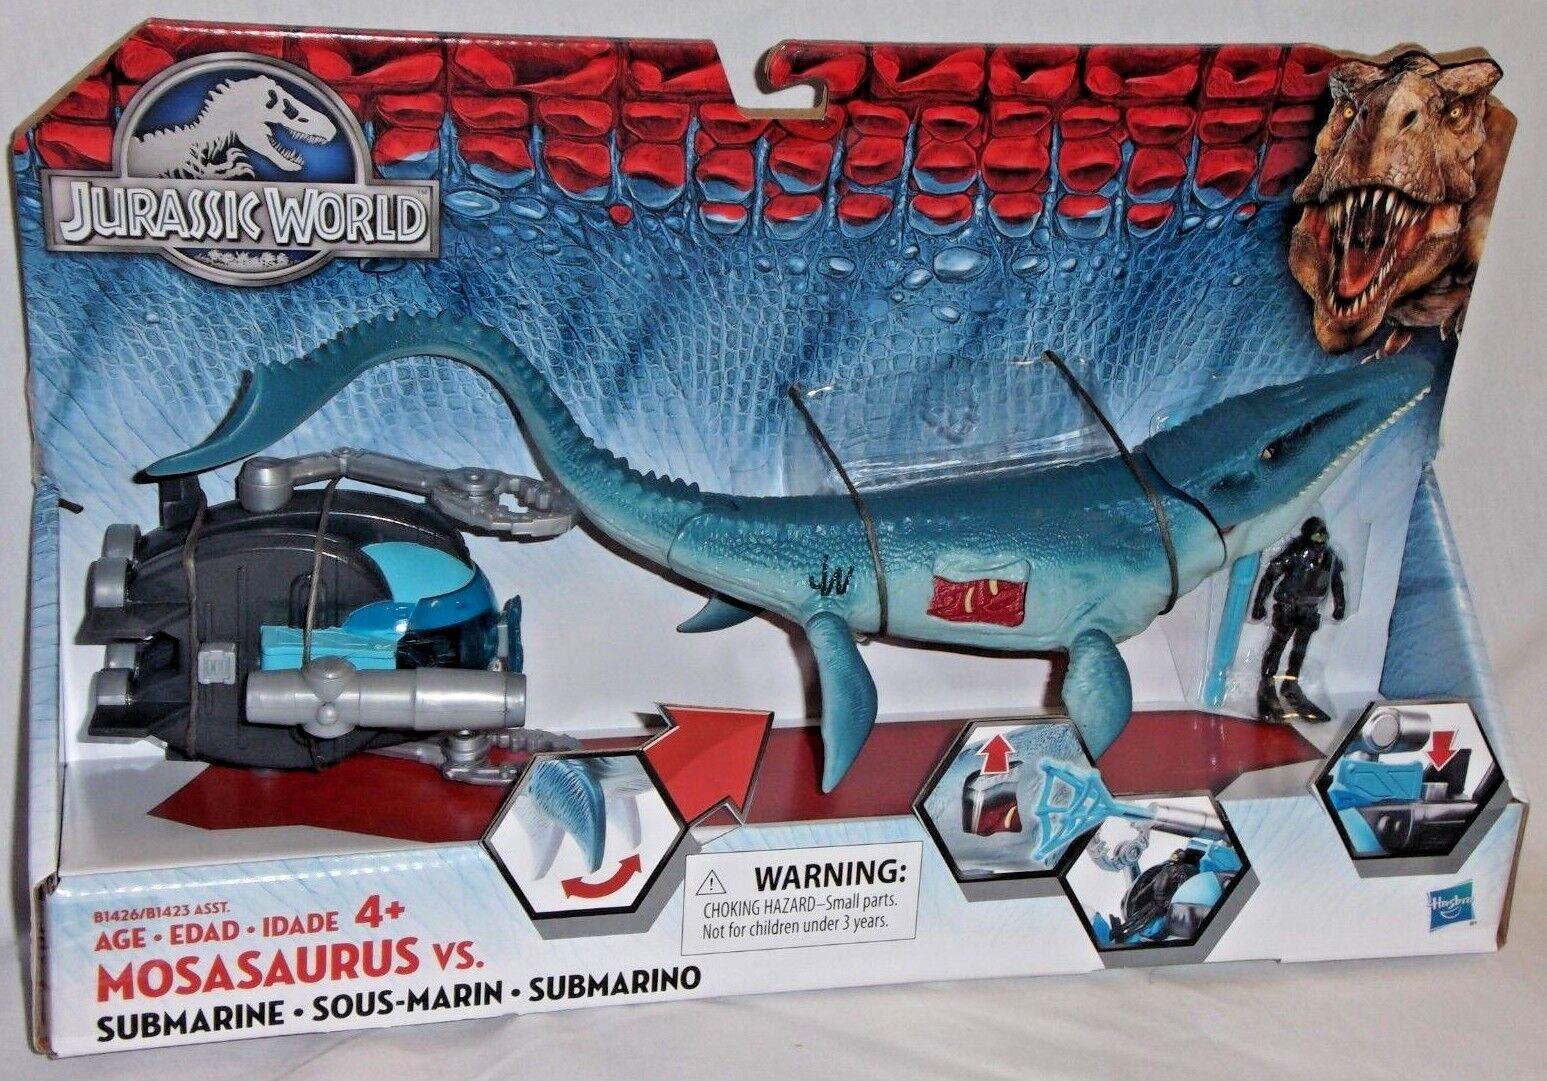 MISP Hasbro MOSASAURUS SUBMARINE Dinosaur Dinosaur Dinosaur JURASSIC PARK WORLD Sea Water Reptile bfafe9